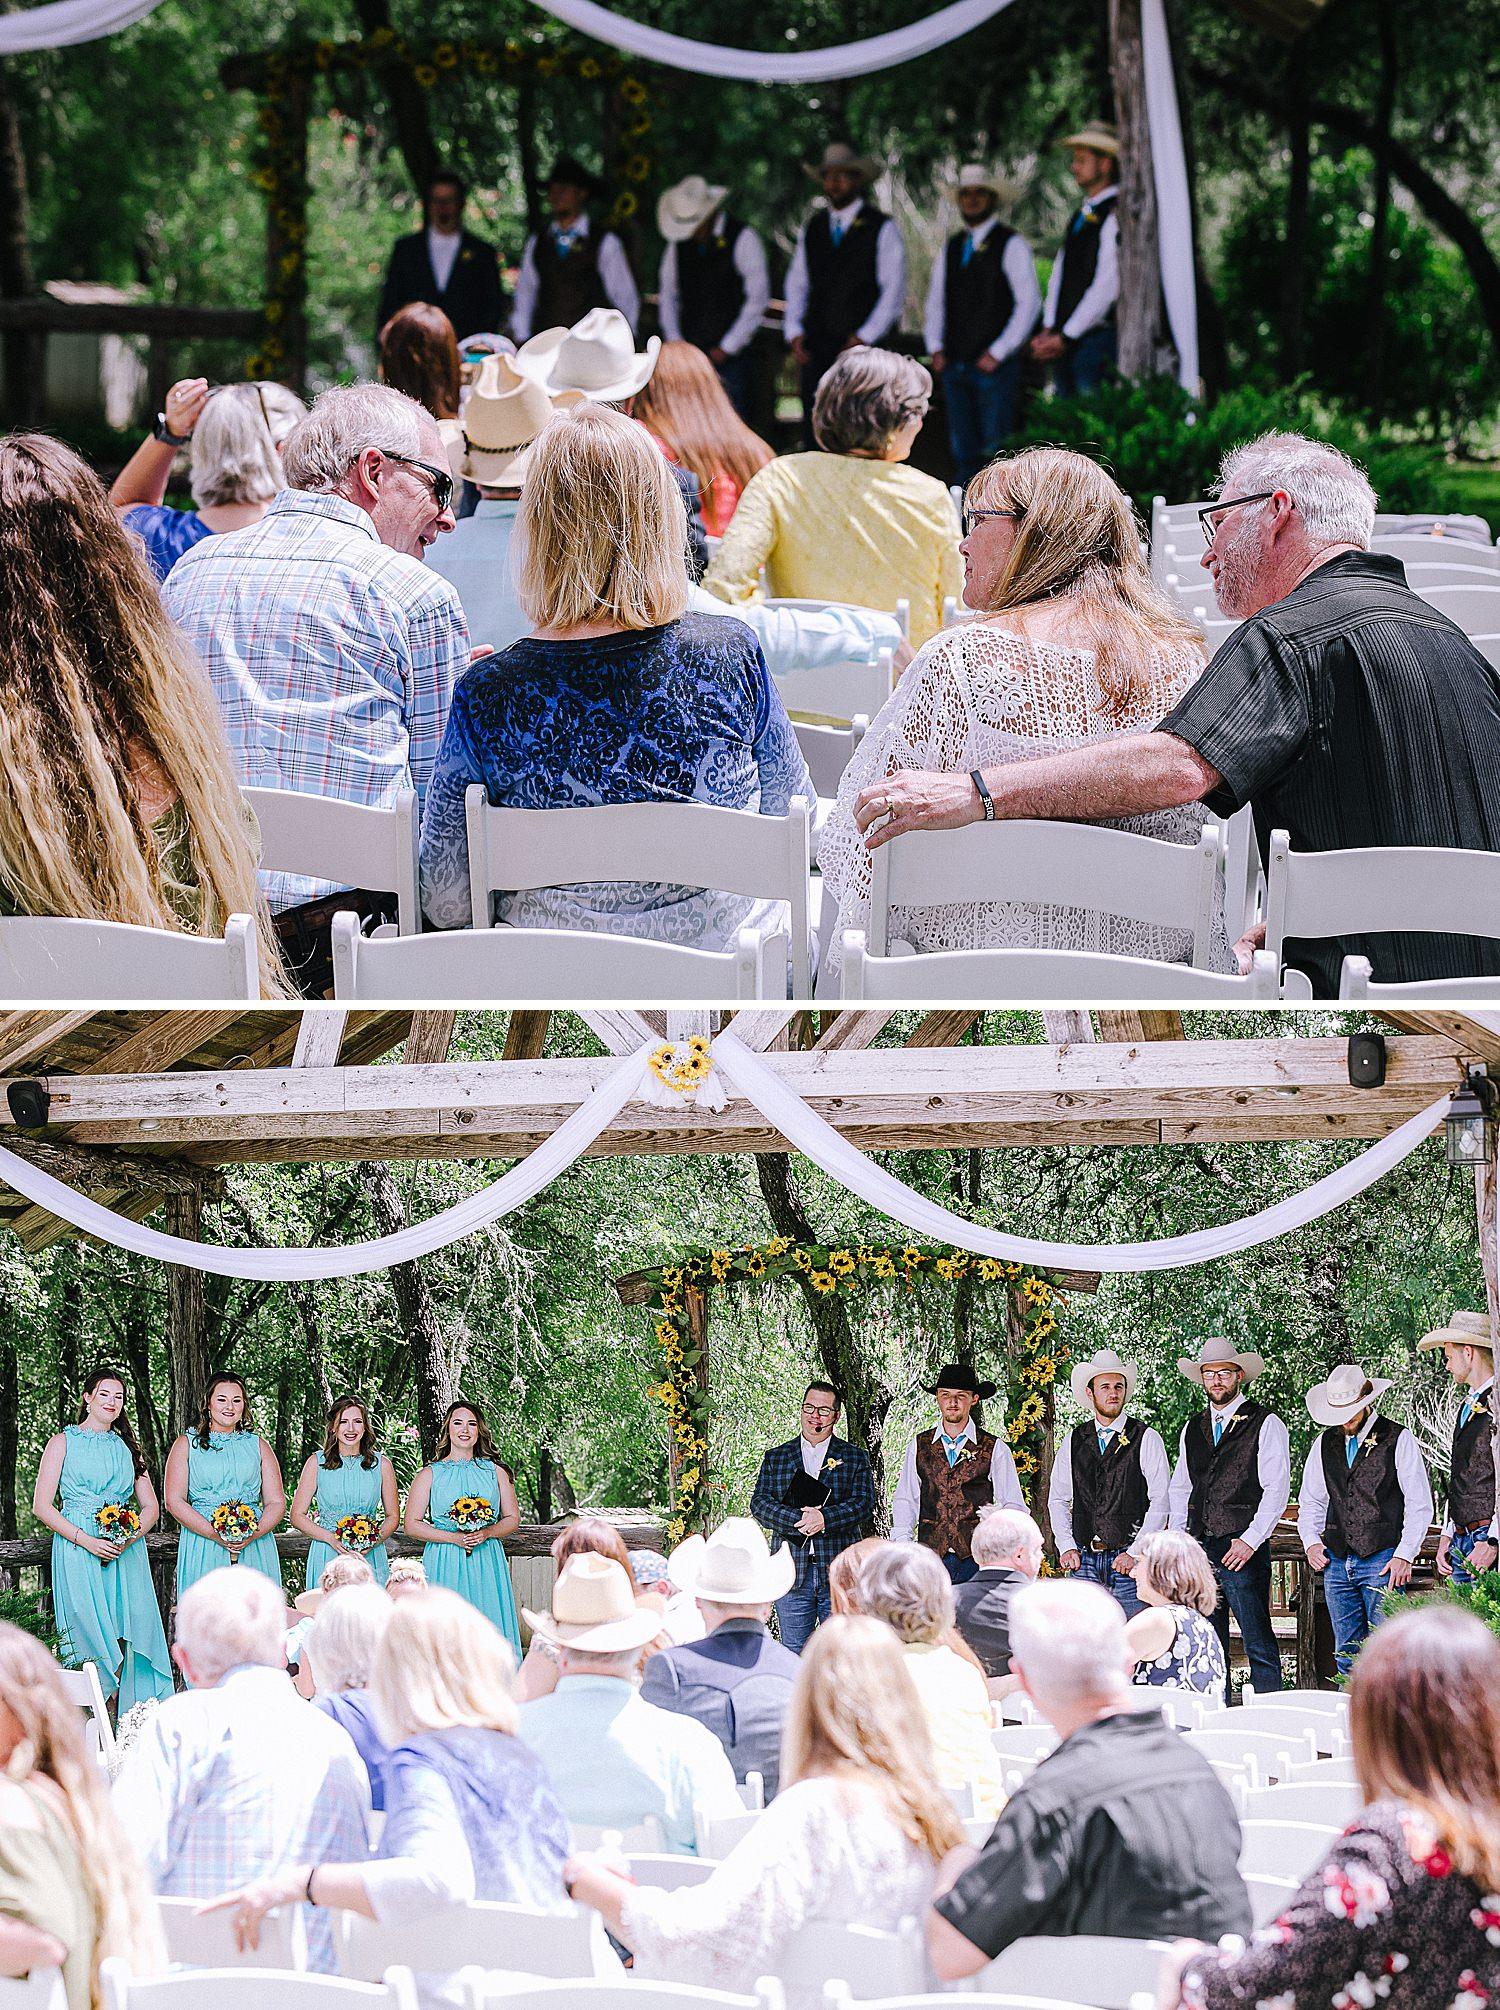 Carly-Barton-Photography-Old-Town-Texas-Rustic-Wedding-Photos-Sunflowers-Boots-Kyle-Texas_0035.jpg